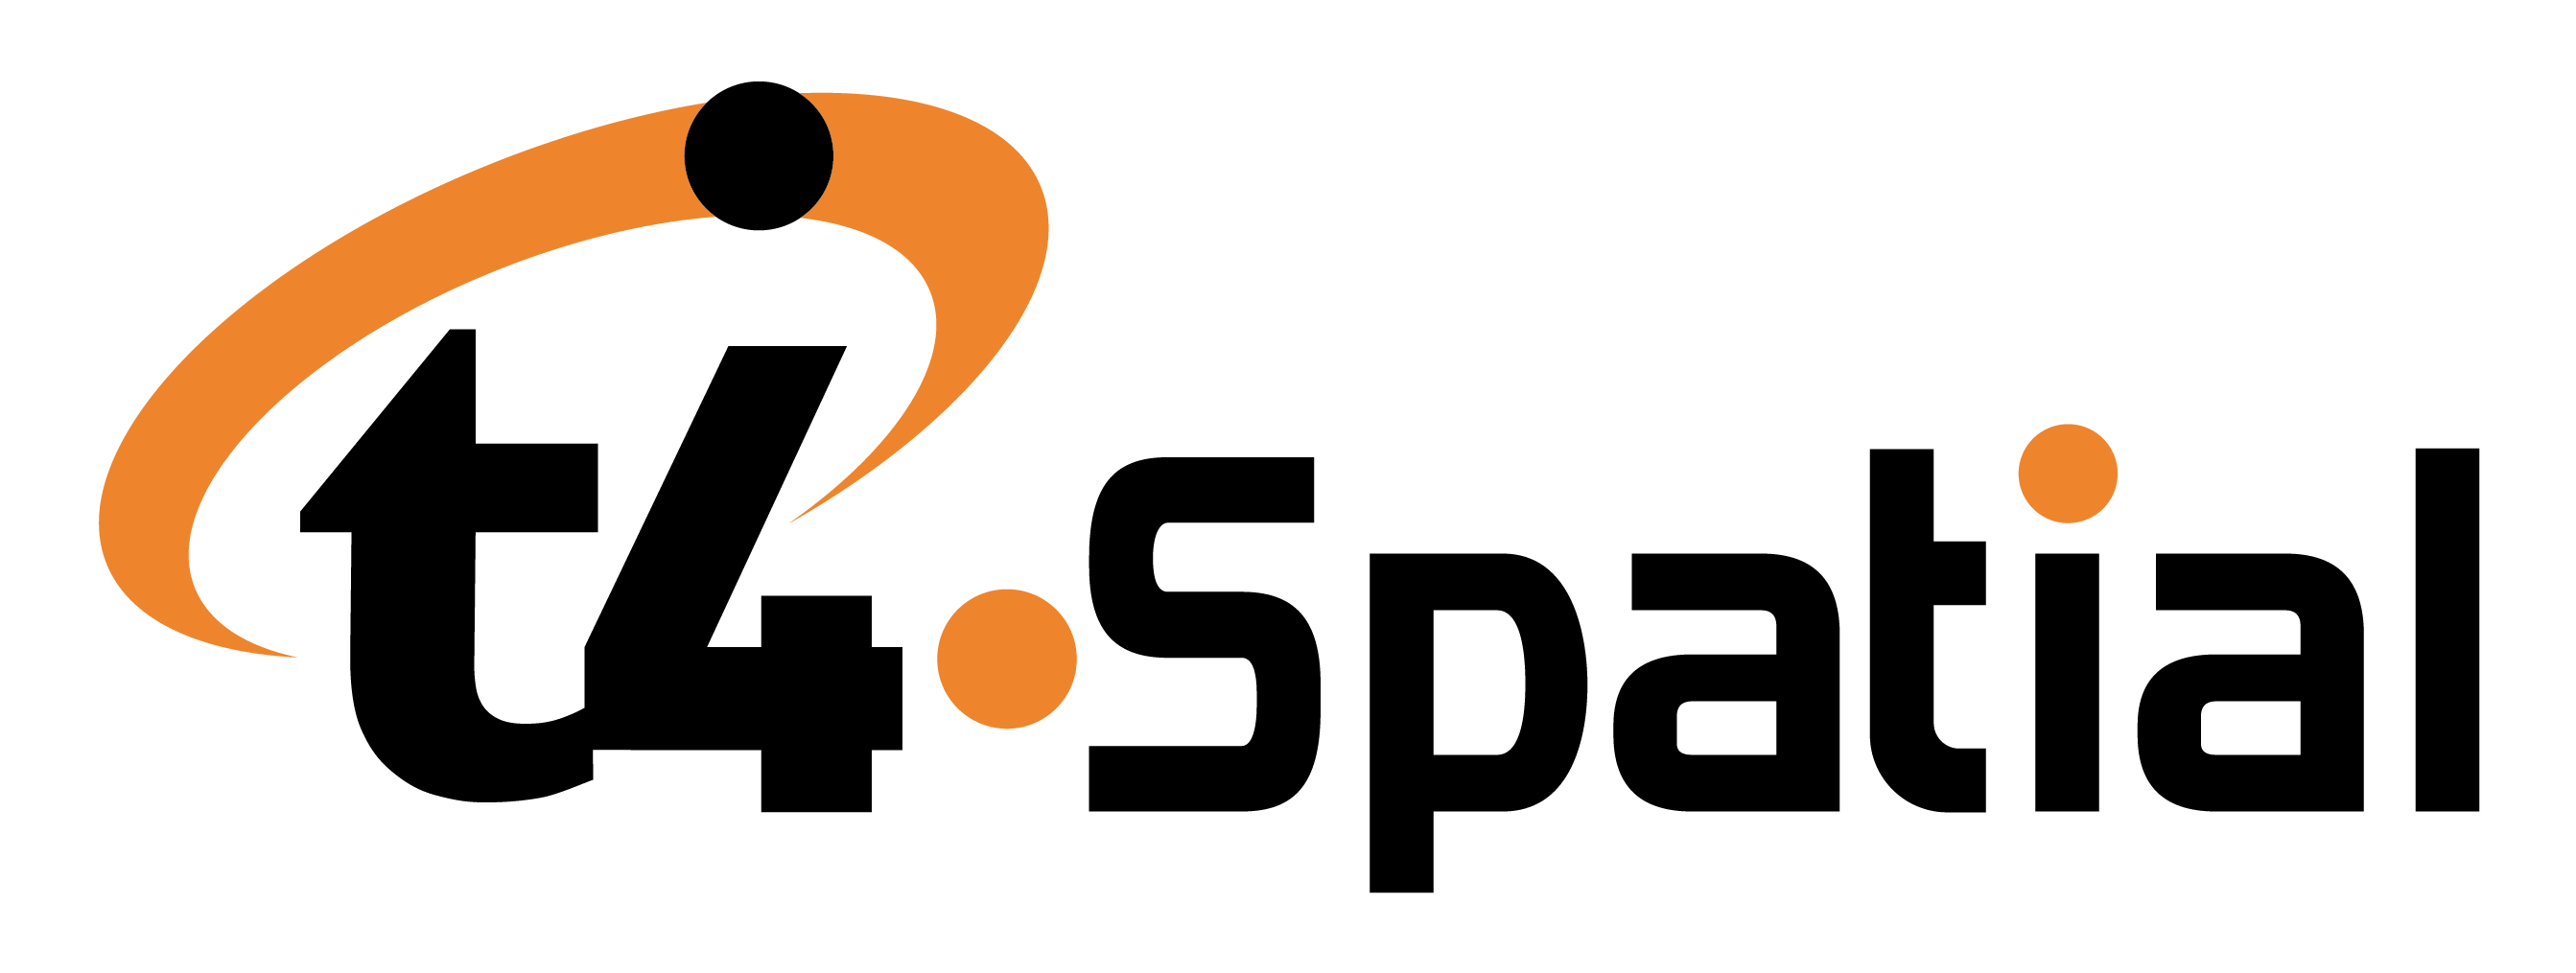 t4 spatial logo-01-Jul-07-2021-04-00-06-73-PM